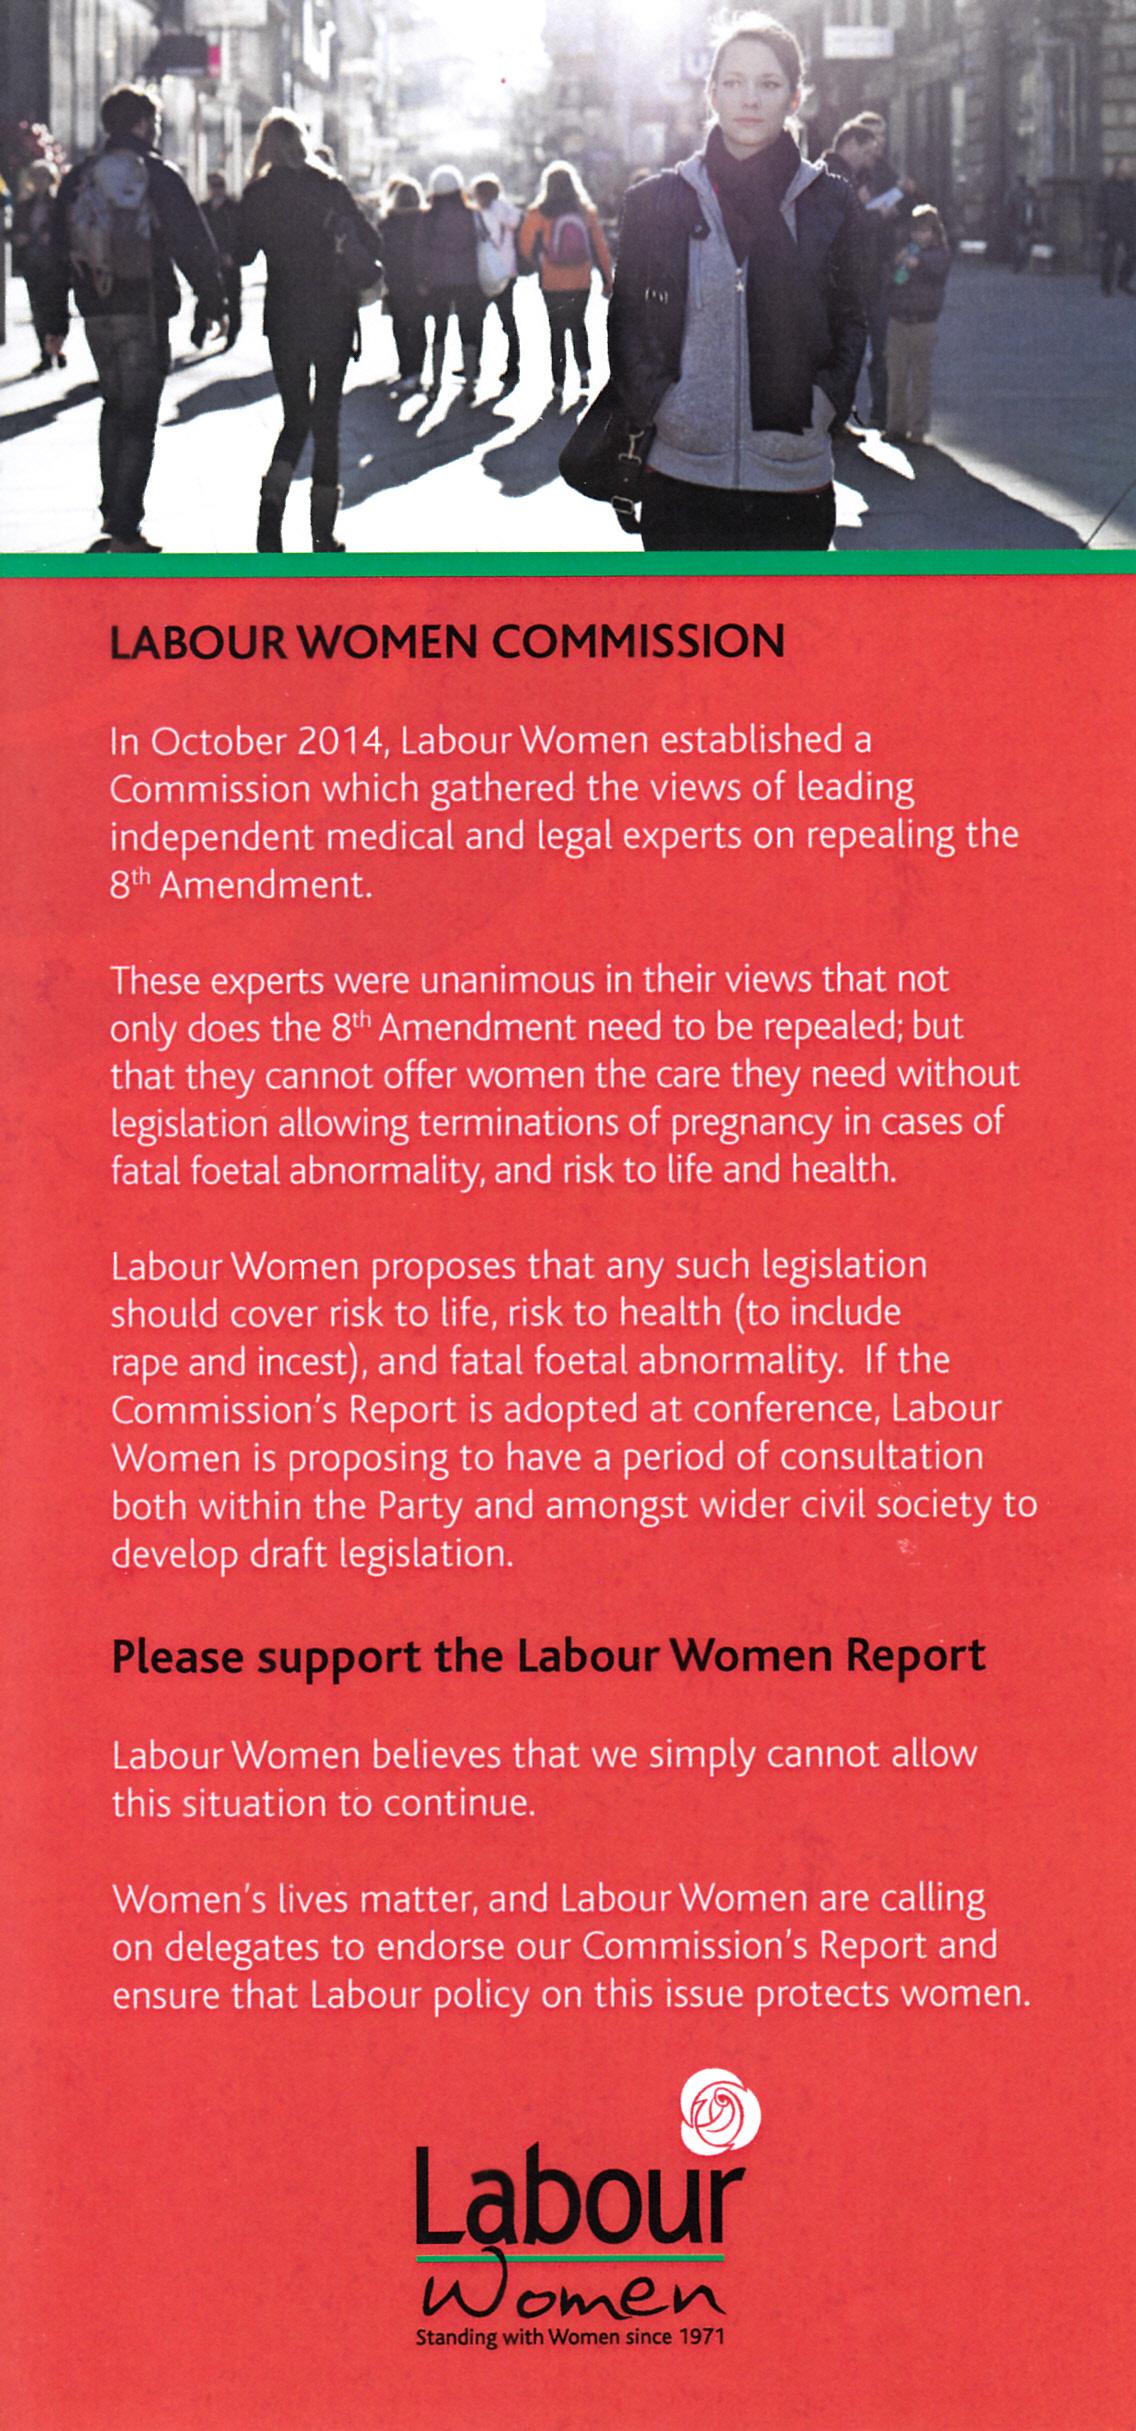 Labour_Irlanda_0004